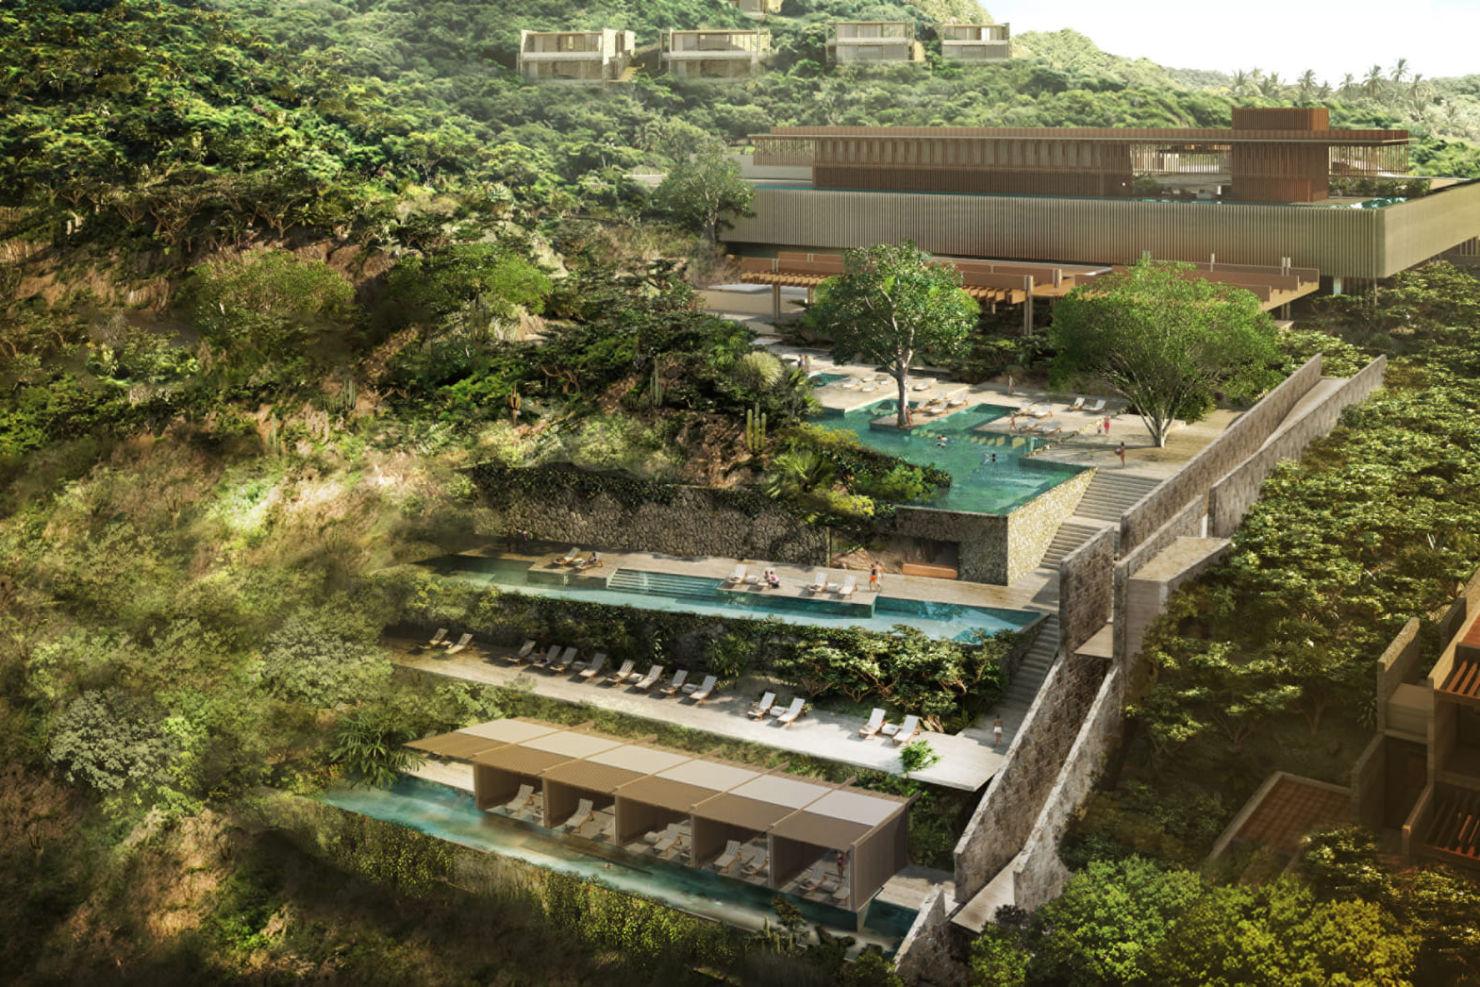 Hoteles en México que abrirán sus puertas en 2021